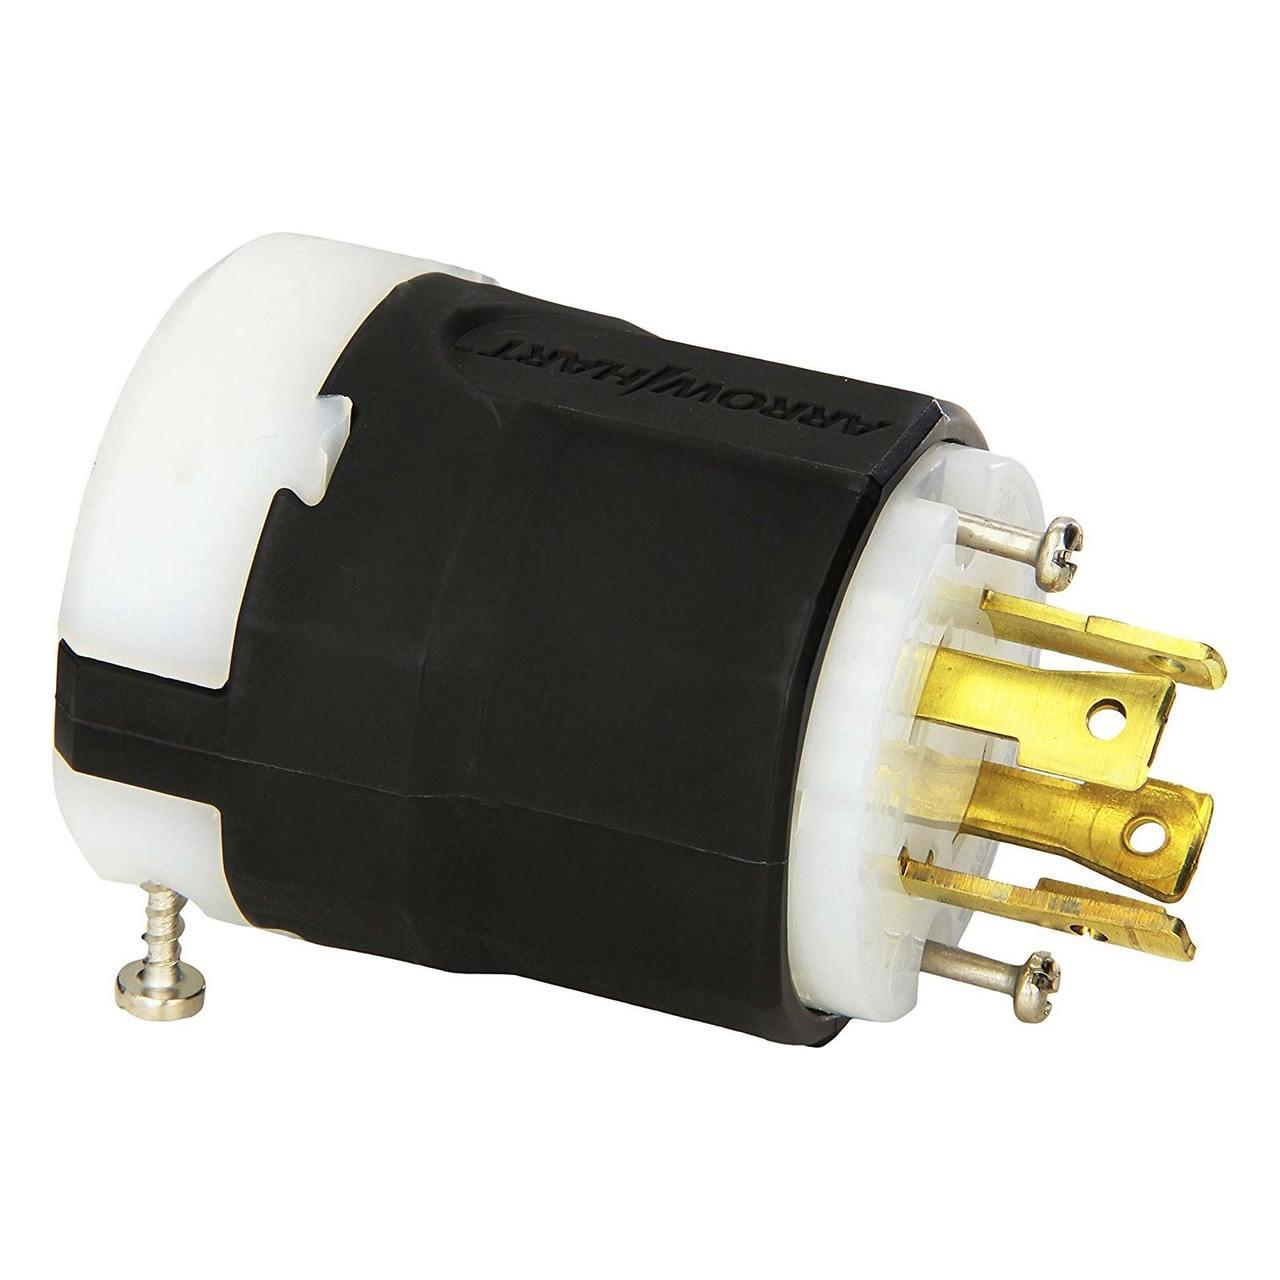 l14 30 diameter 2002 ford transit stereo wiring diagram generac plug t l 30a 125 250v tremtech electrical